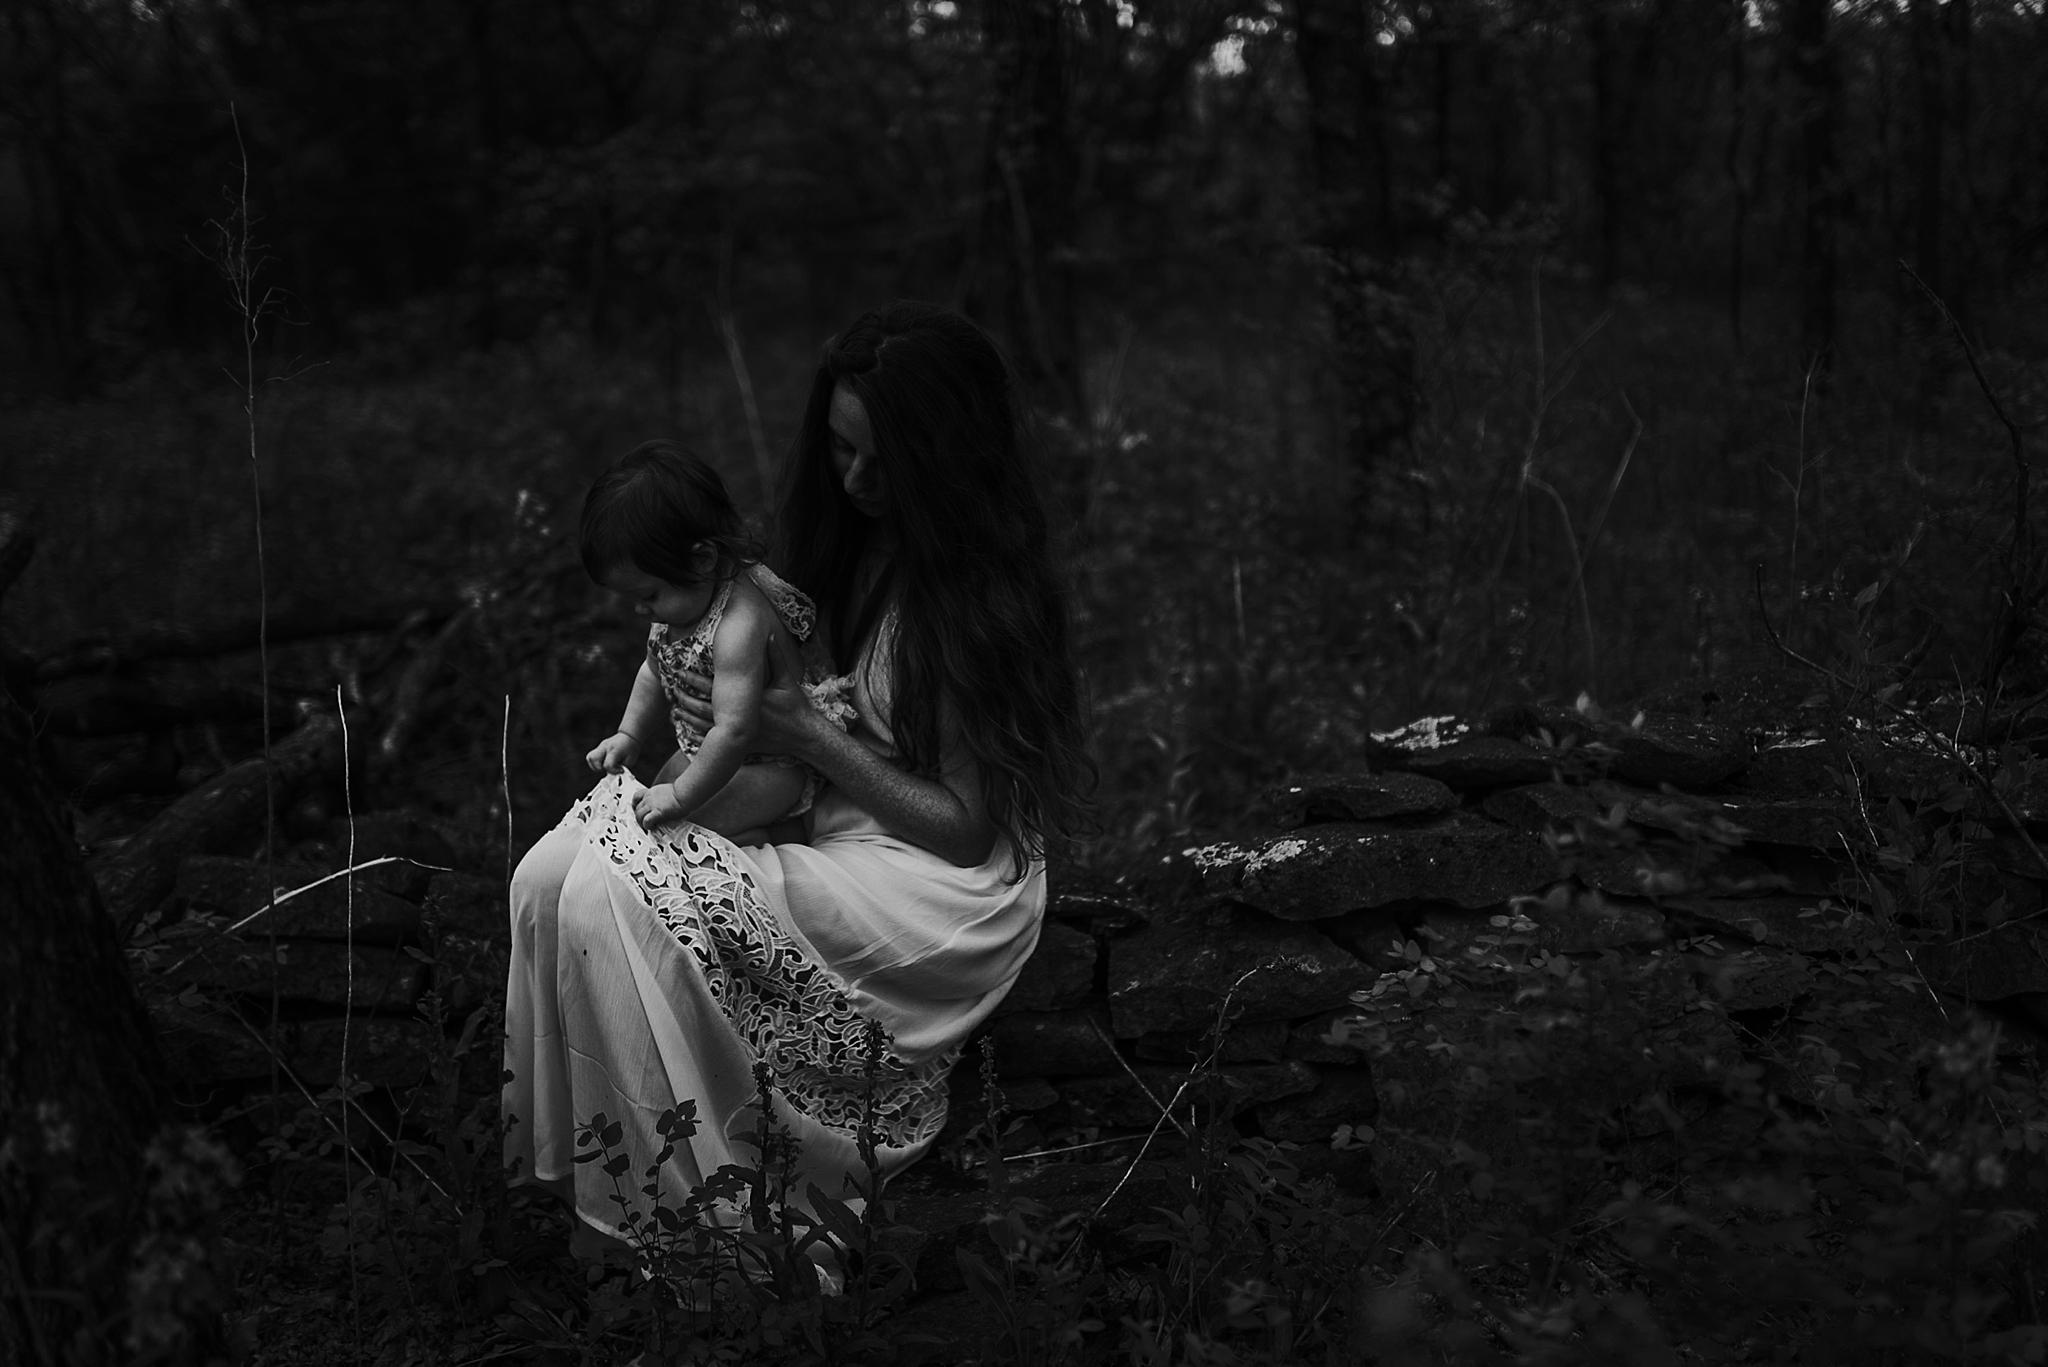 twyla jones photography - mother daughter - field and forest-4726_treasure coast florida.jpg